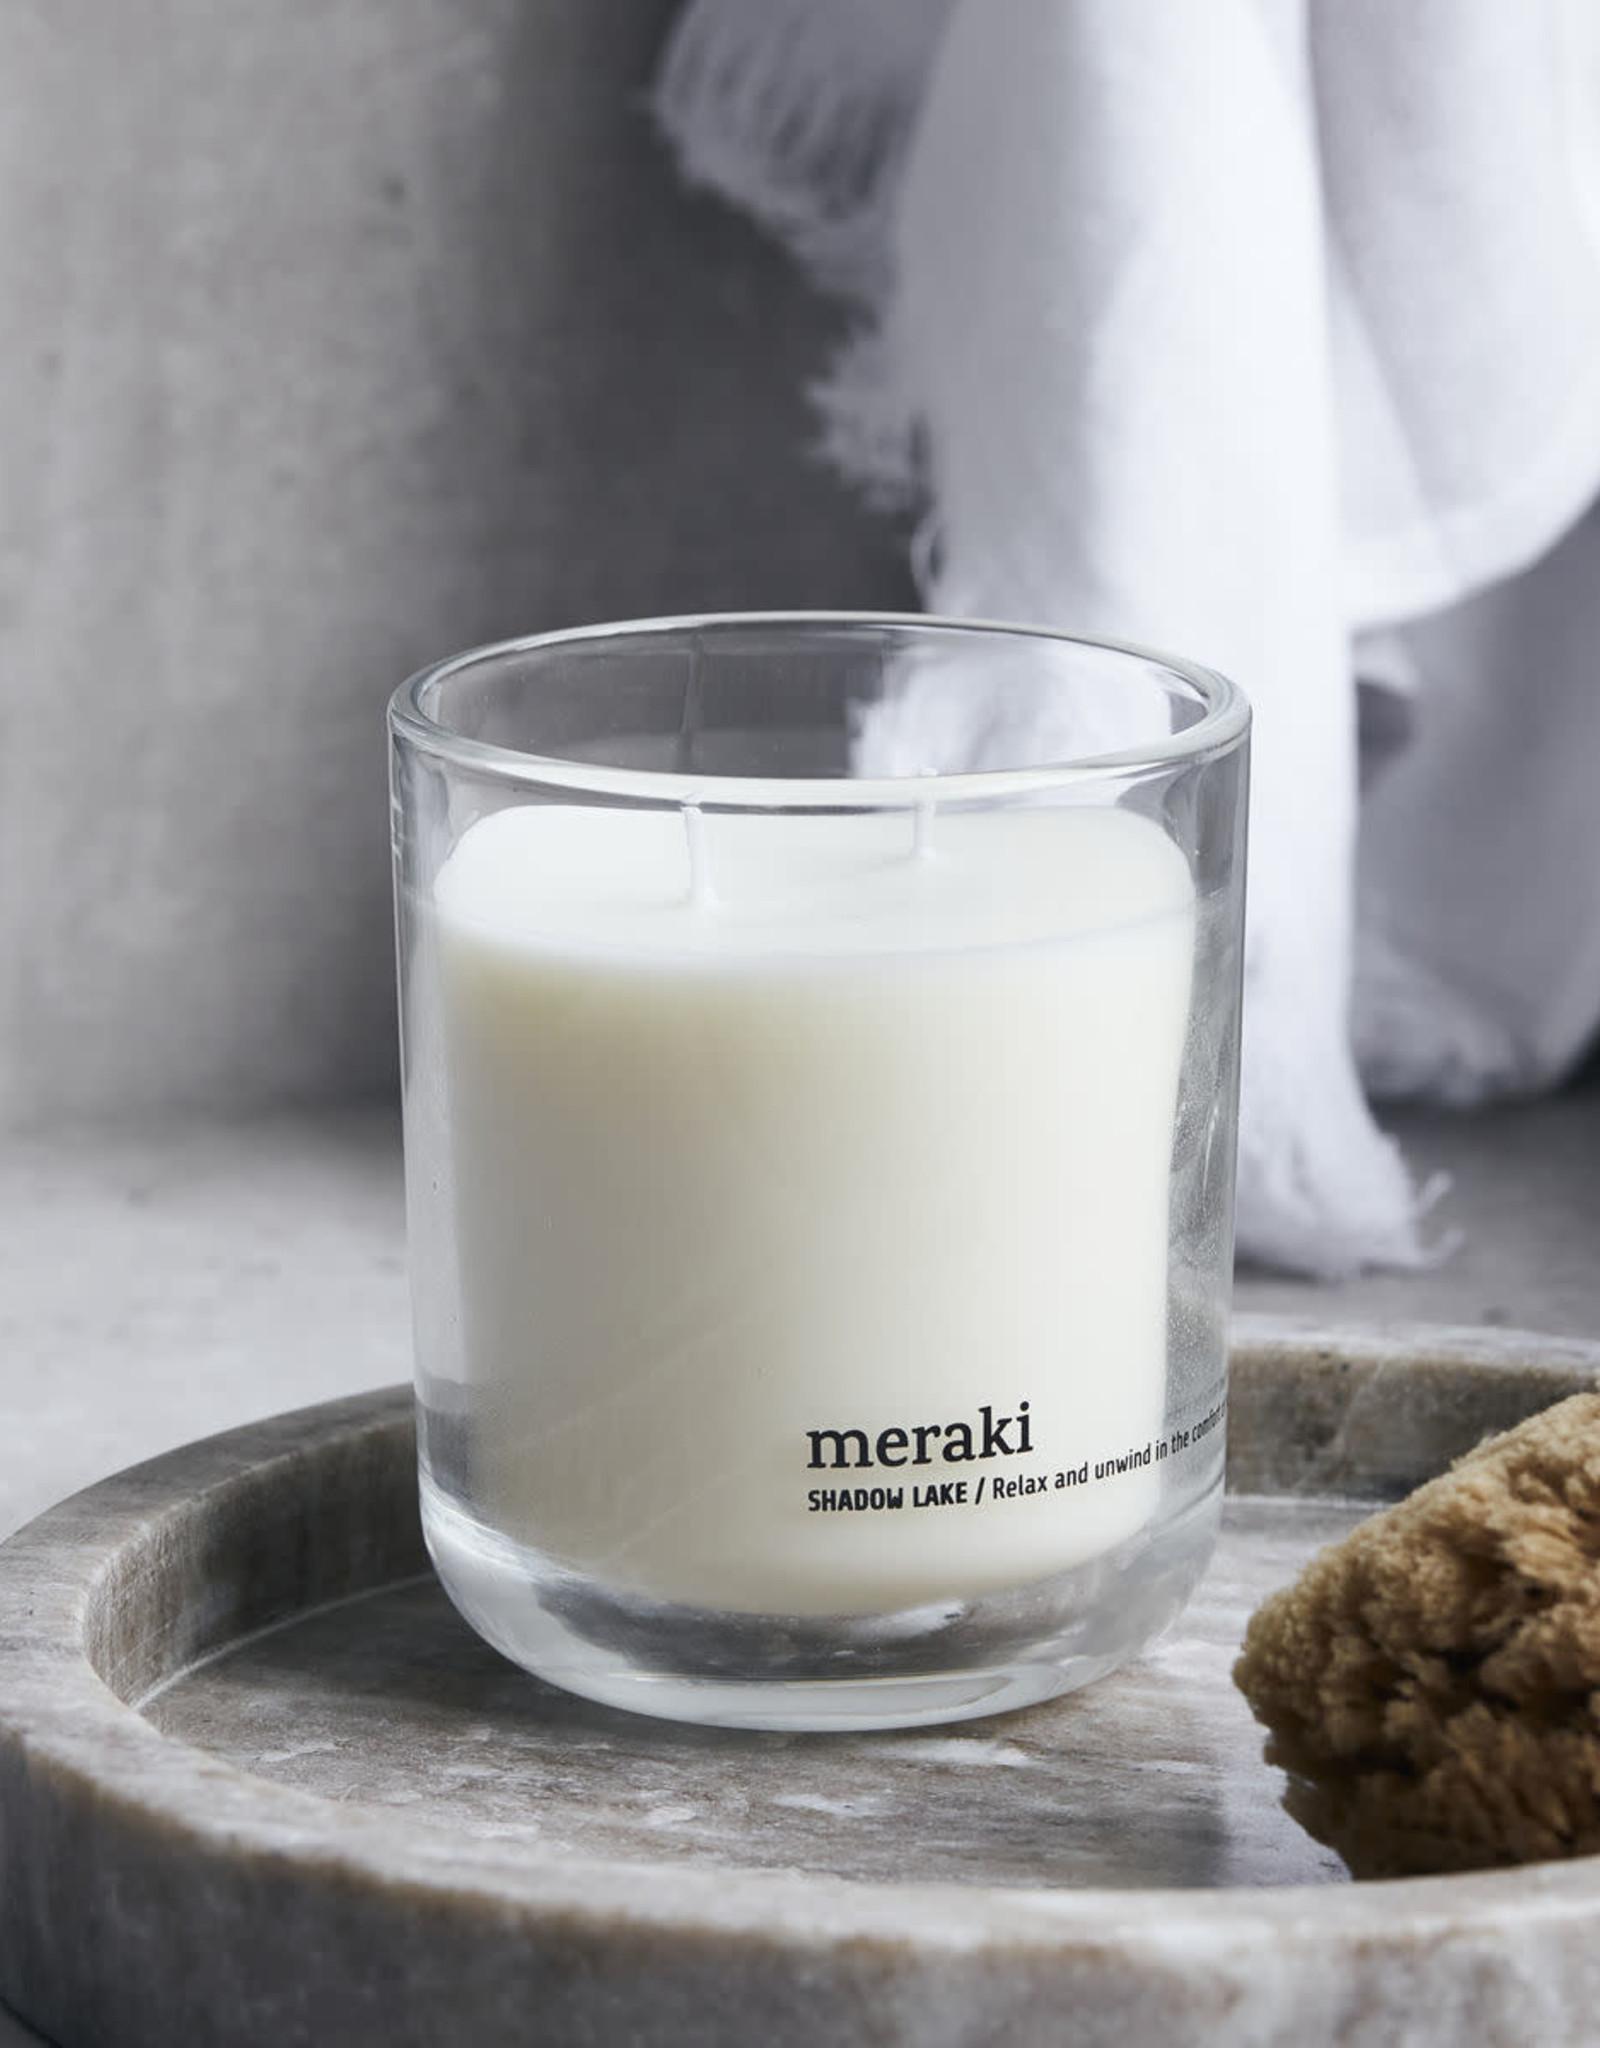 Meraki Meraki - Scented candle shadow lake